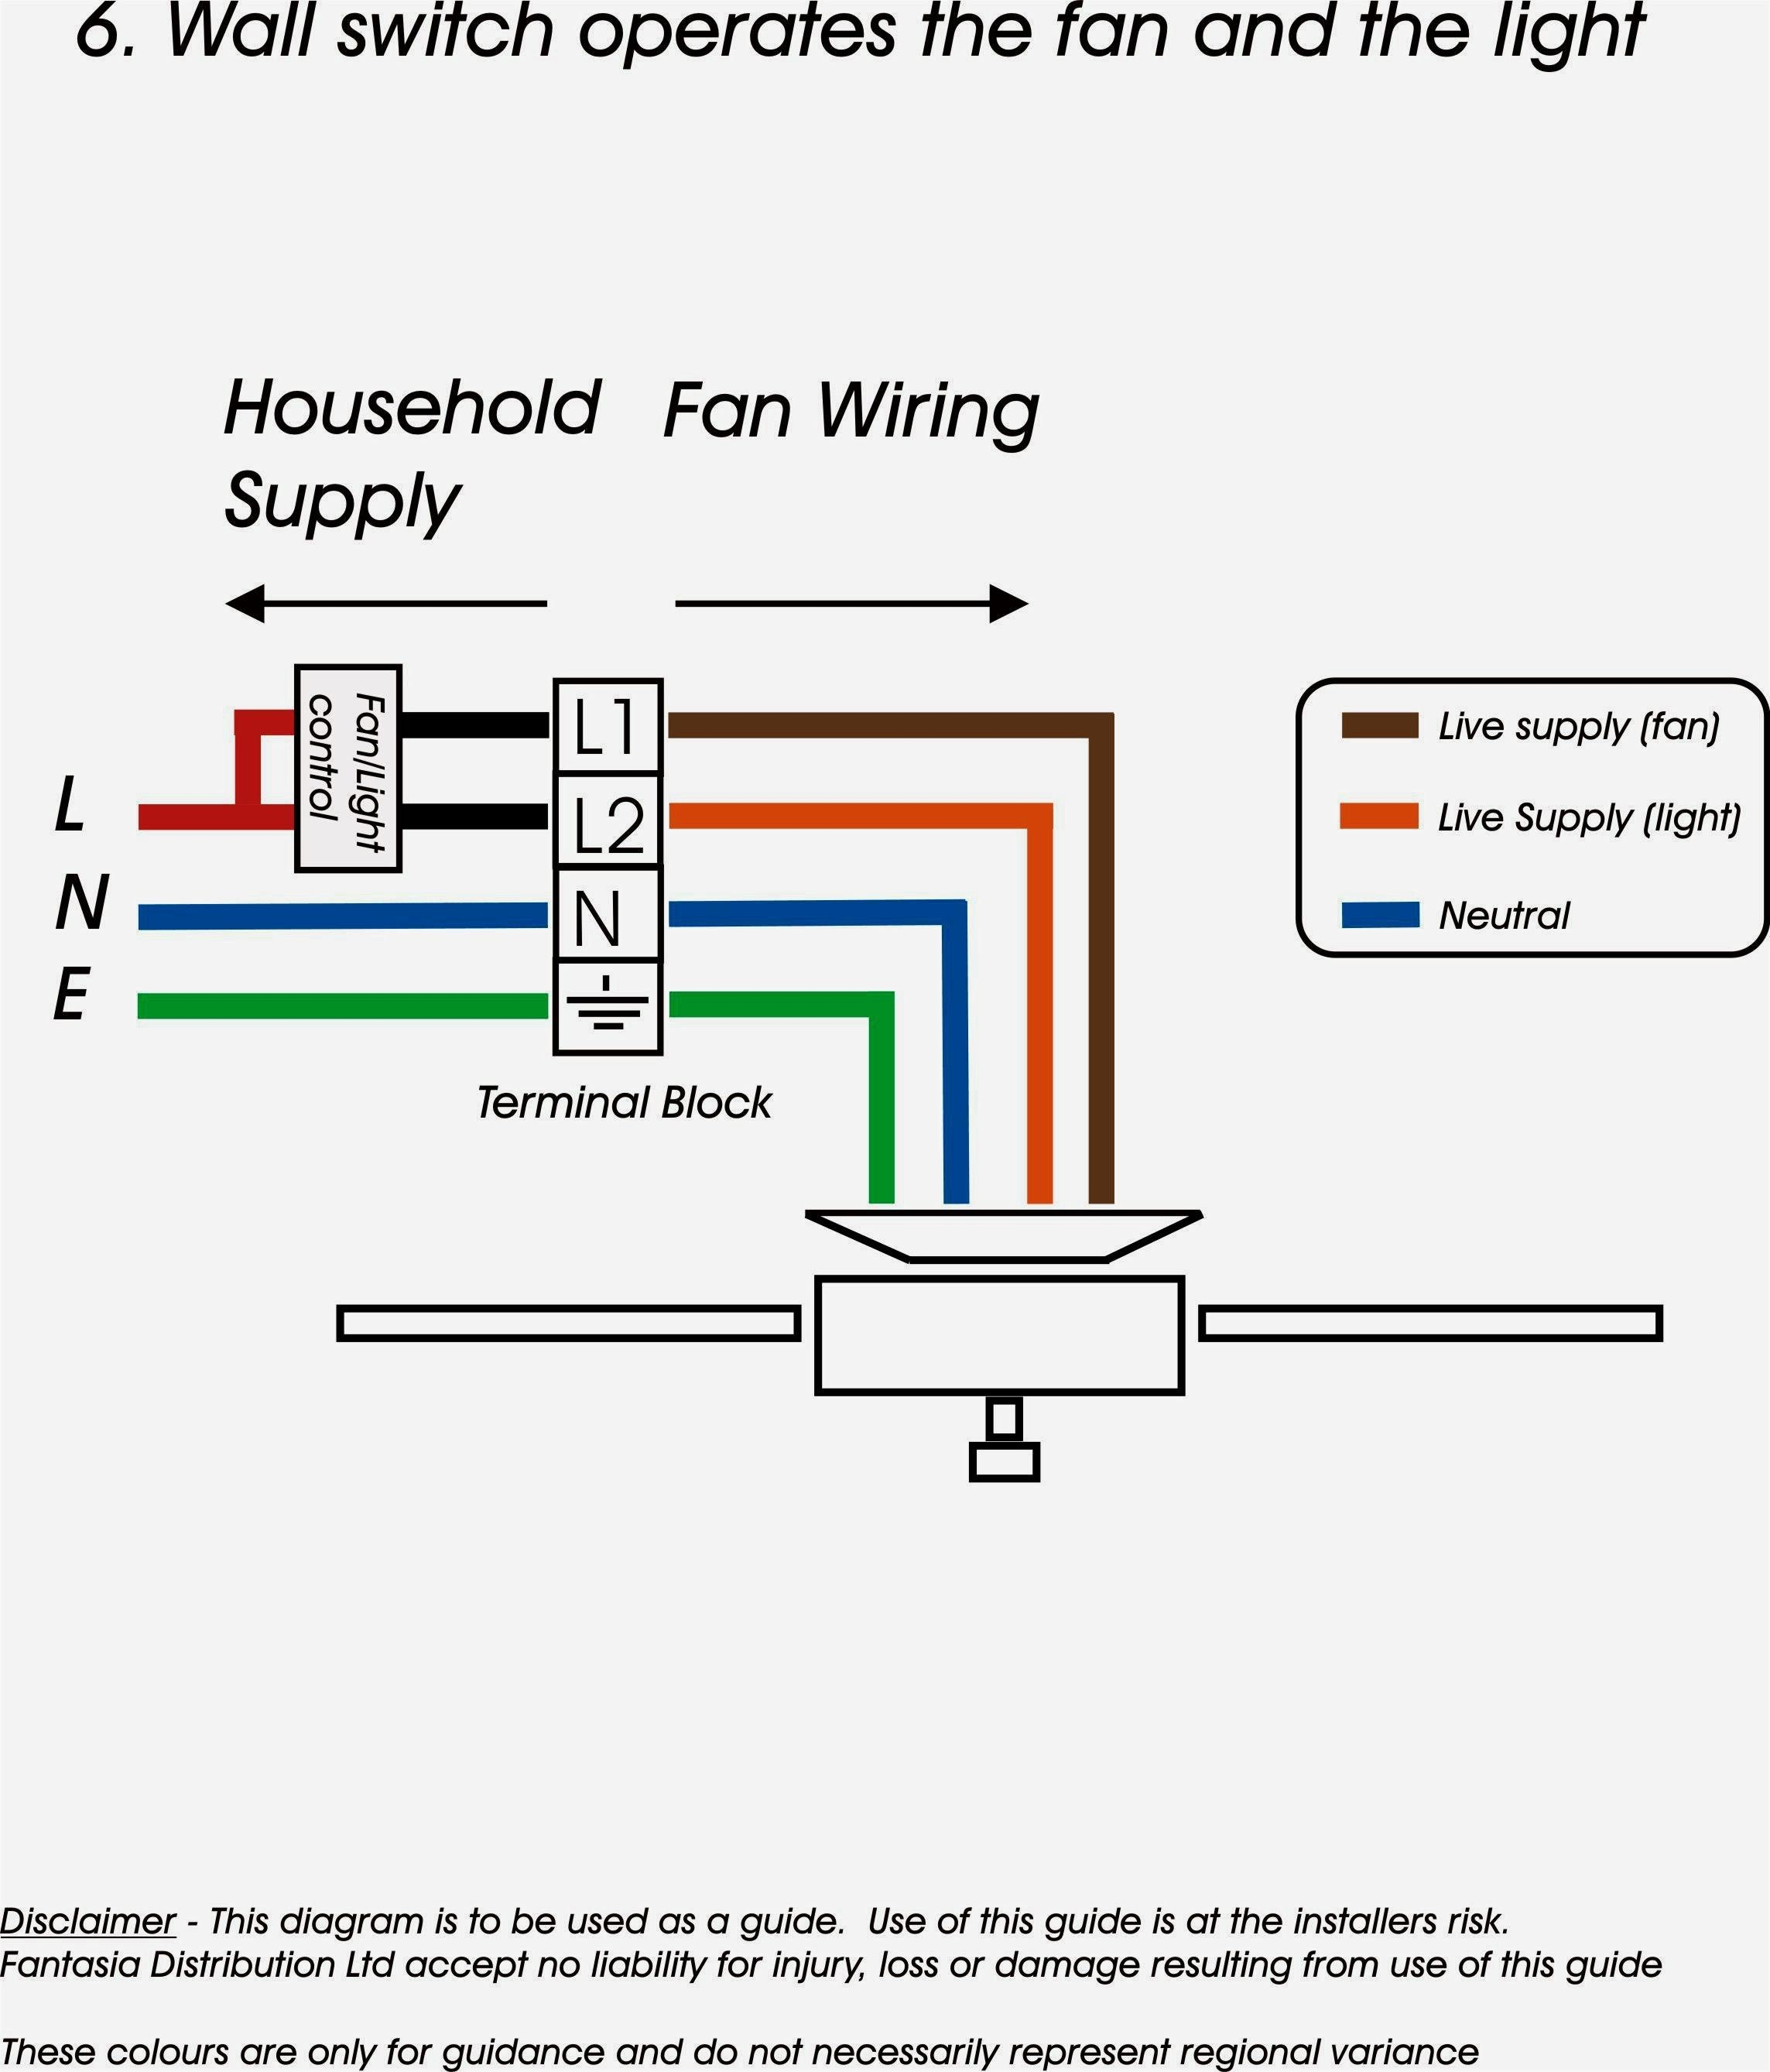 allanson ballast wiring diagram Download-t12 ballast wiring diagram awesome magnetic f96t12 and justsayessto me rh justsayessto me Fluorescent Ballast Wiring Diagram F72T12 Ballast Wiring Diagram 1-a